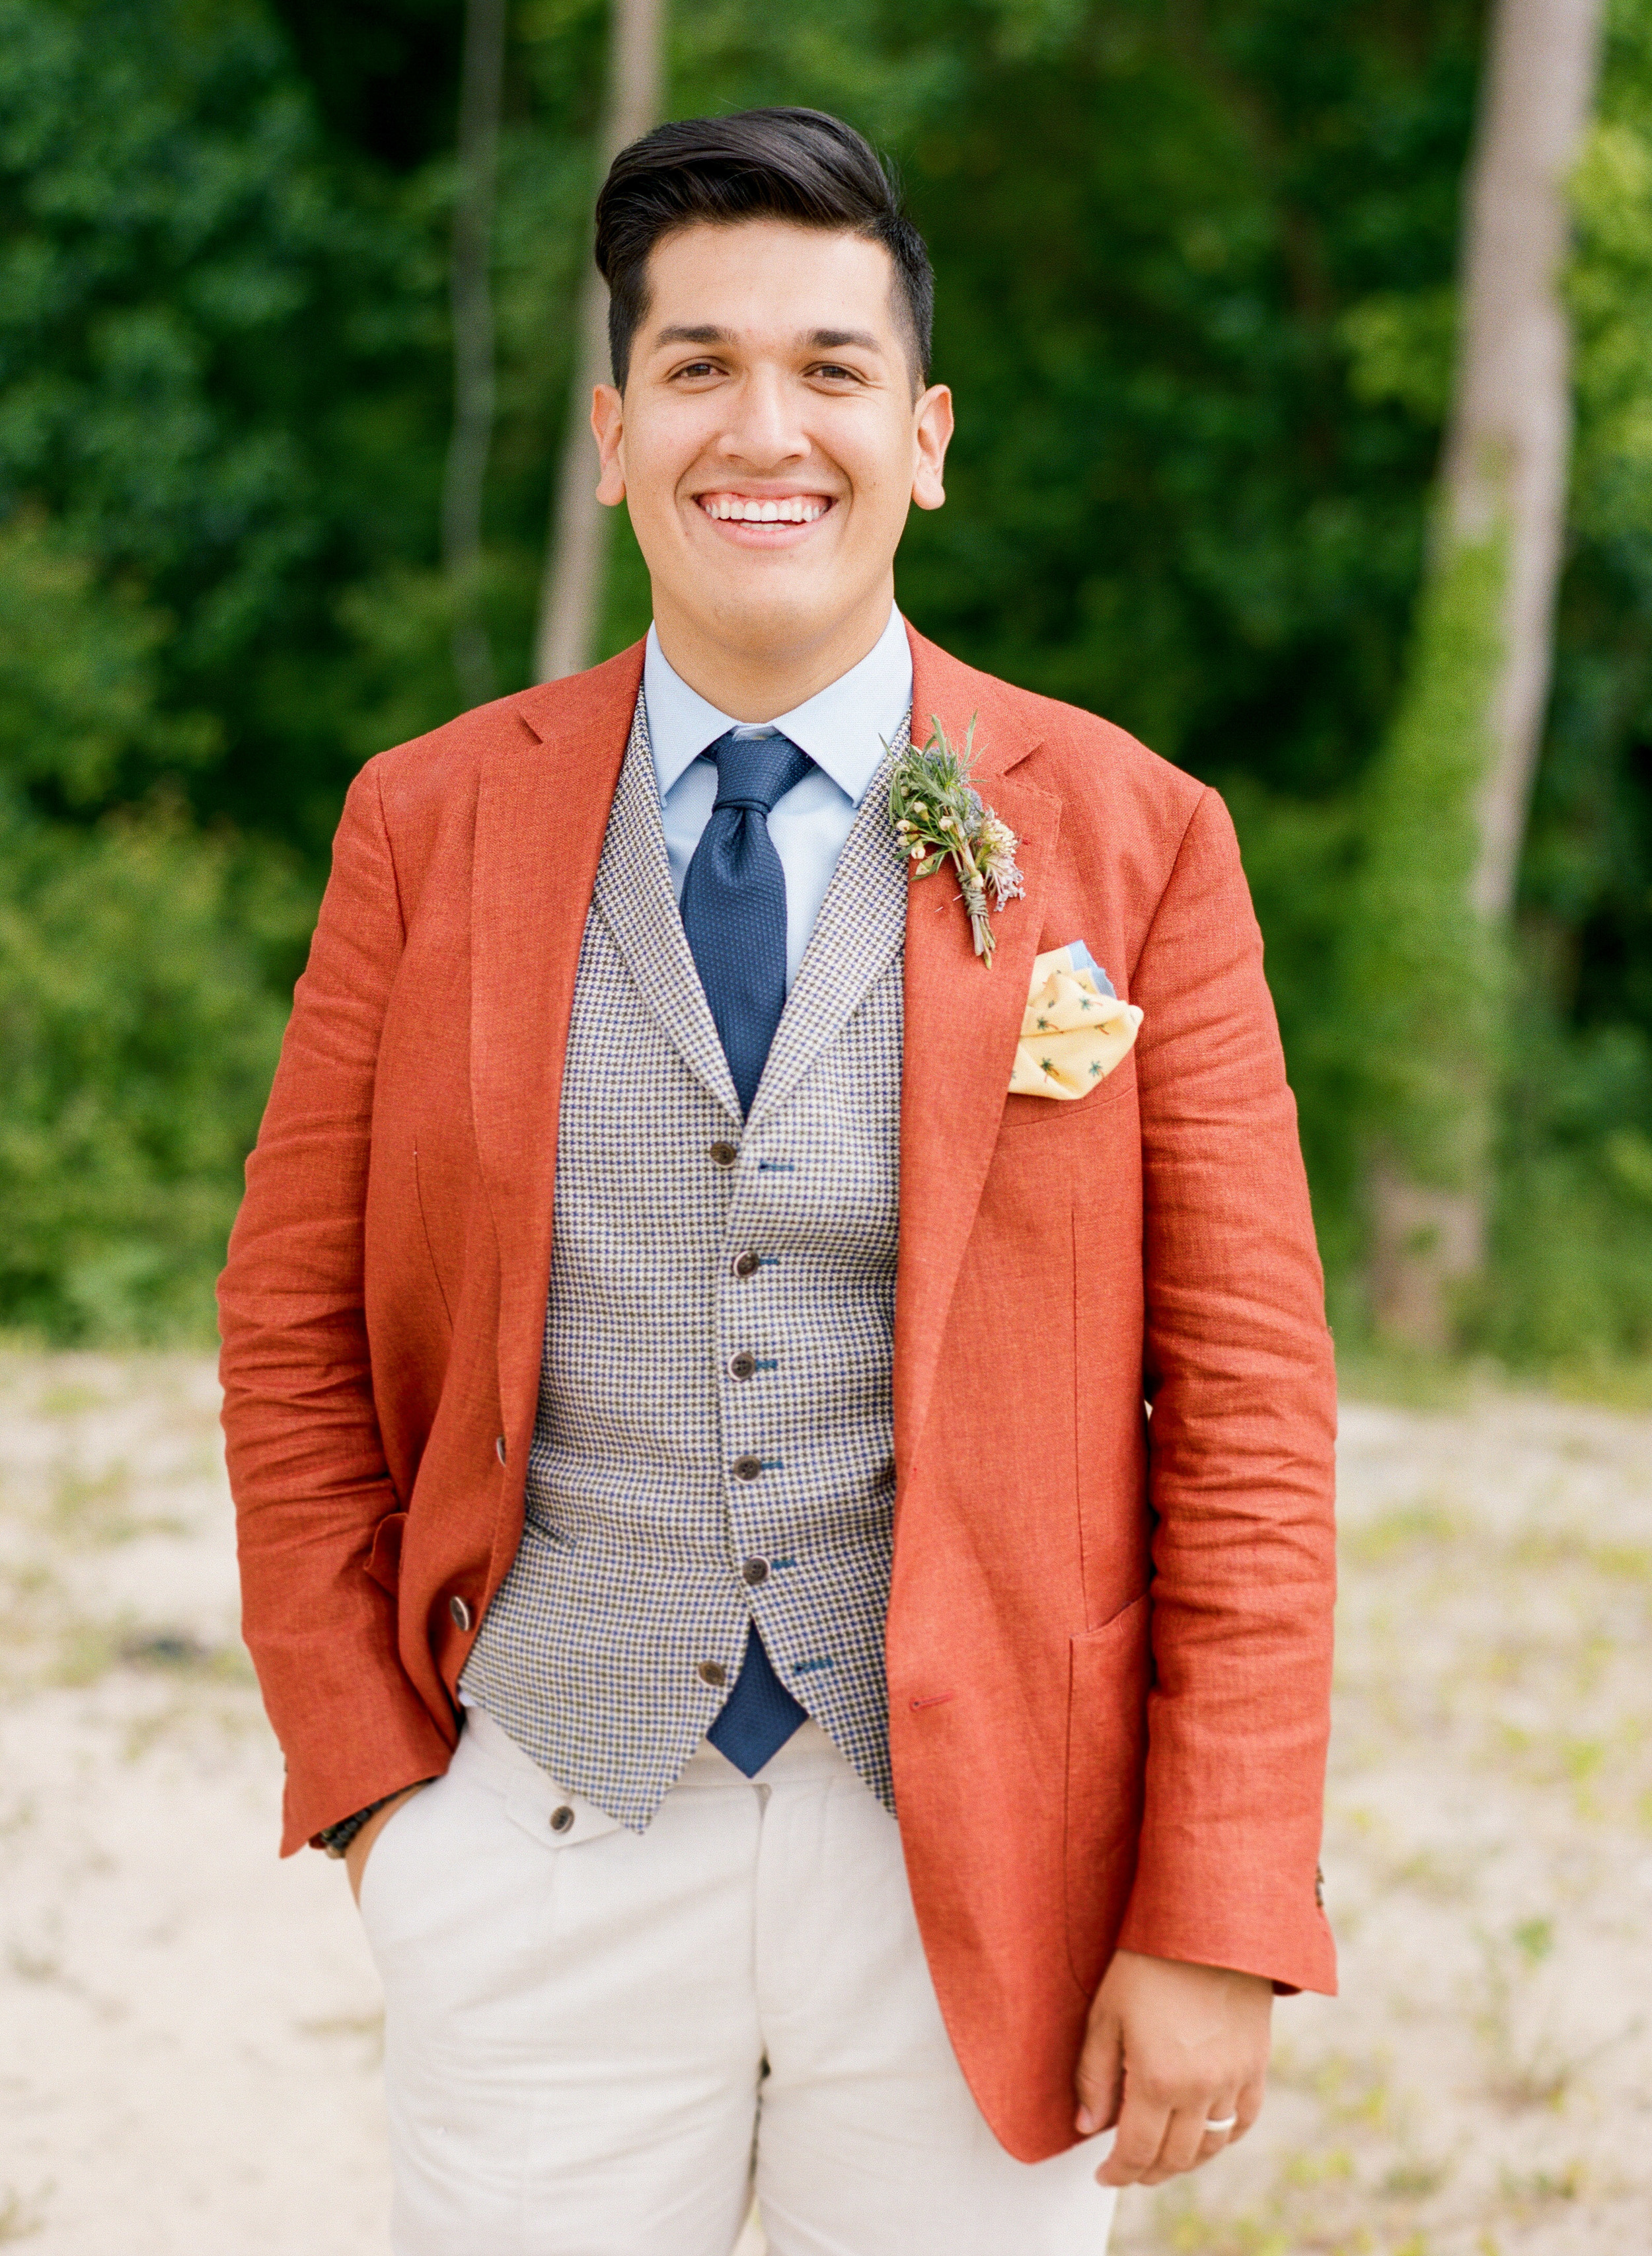 Dana-Fernandez-Photography-Martha-Stewart-Weddings-Houston-Texas-Wedding-Photographer-Film-11.jpg